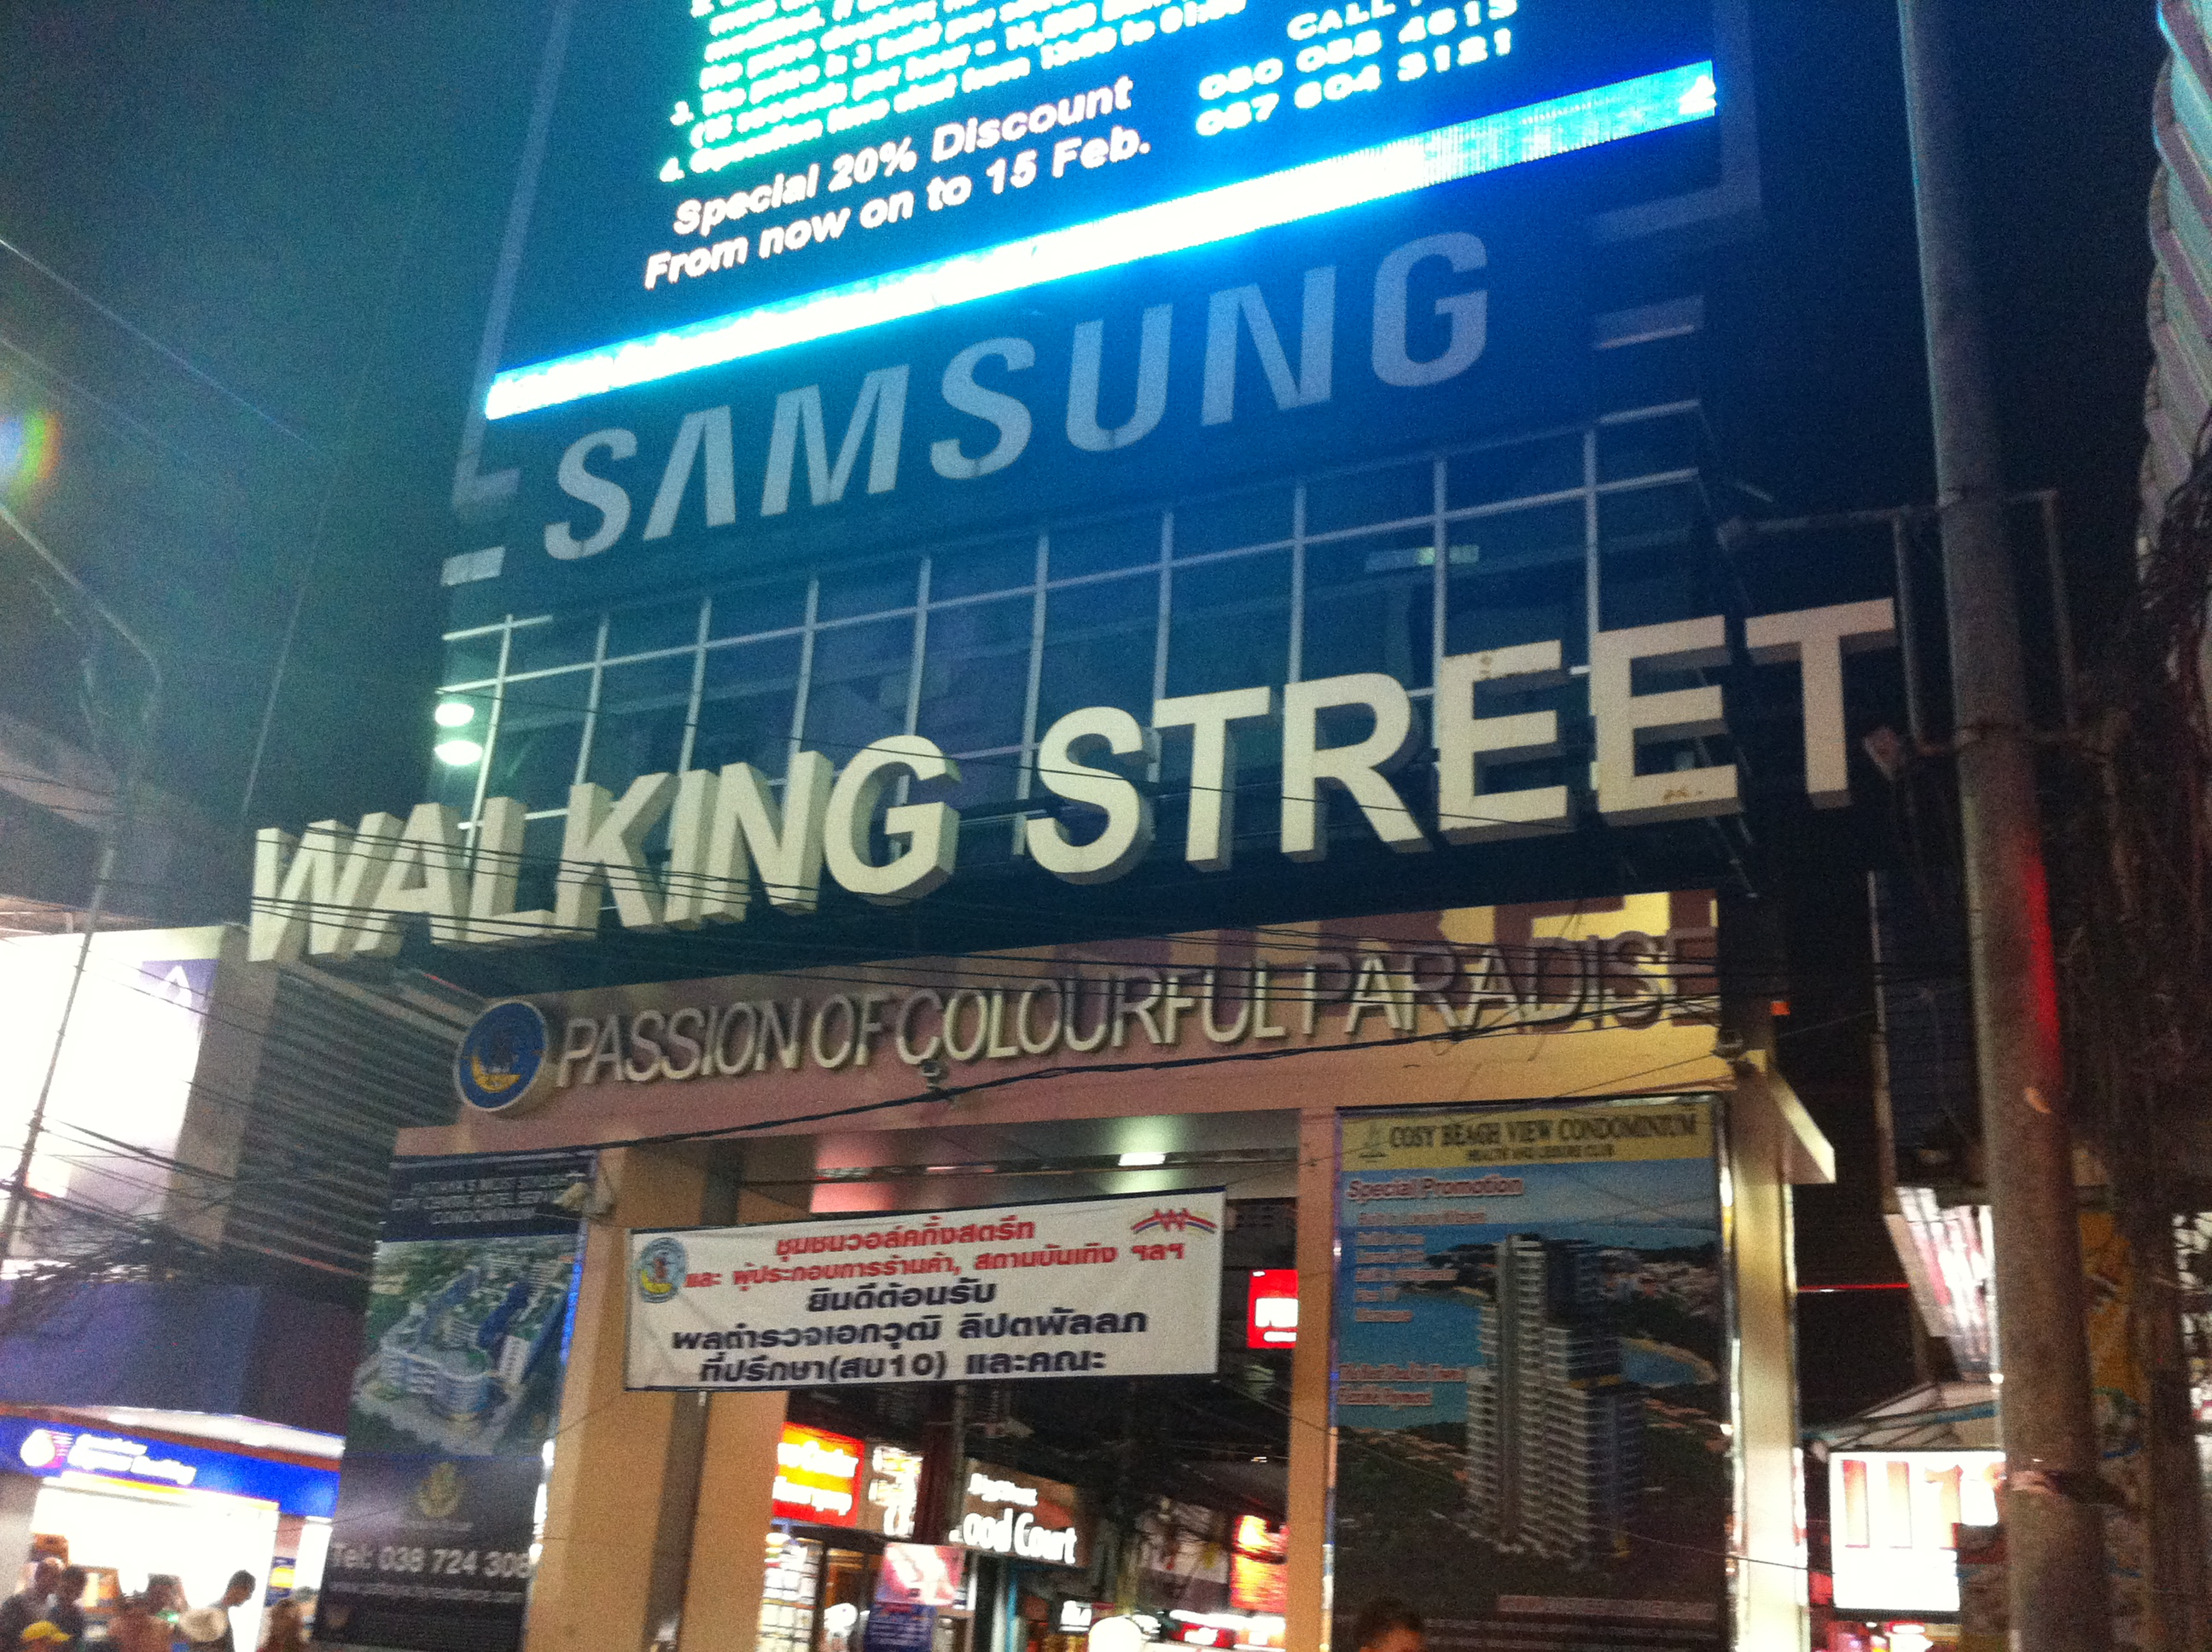 Знаменитая улица Walking Street